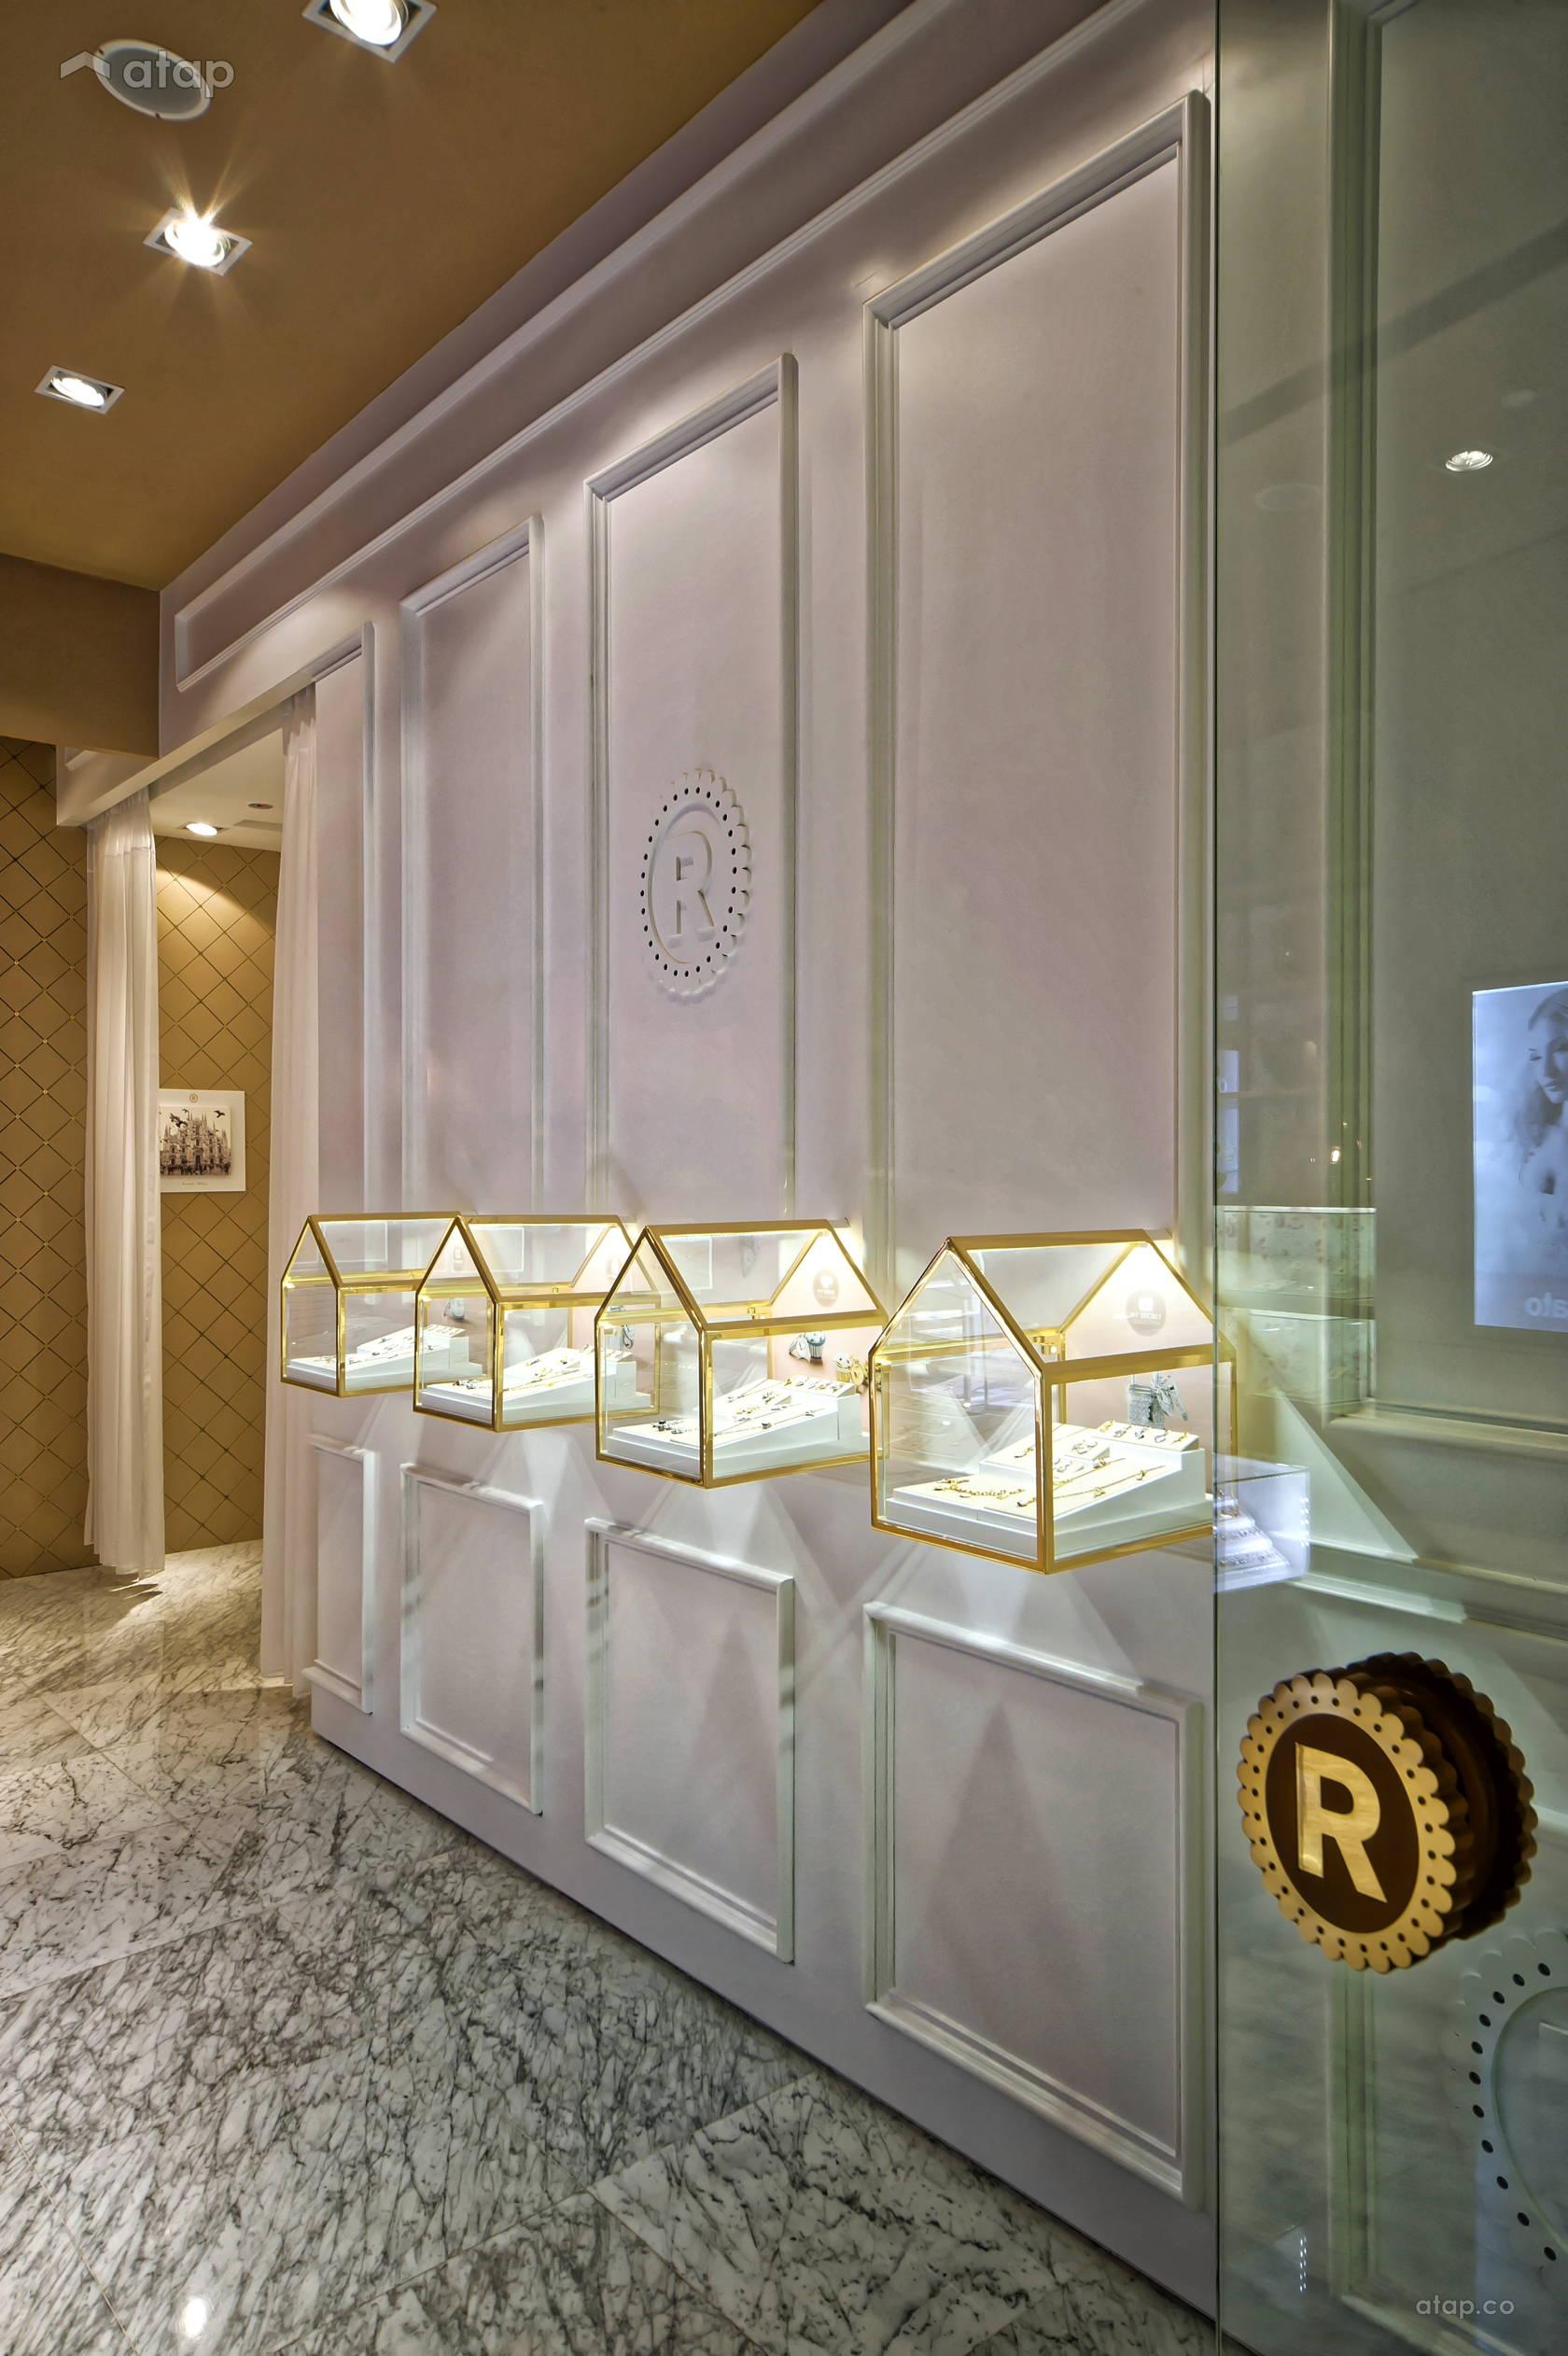 Rosato Jewelry Store Pavilion Interior Design Renovation Ideas Photos And Price In Malaysia Atap Co